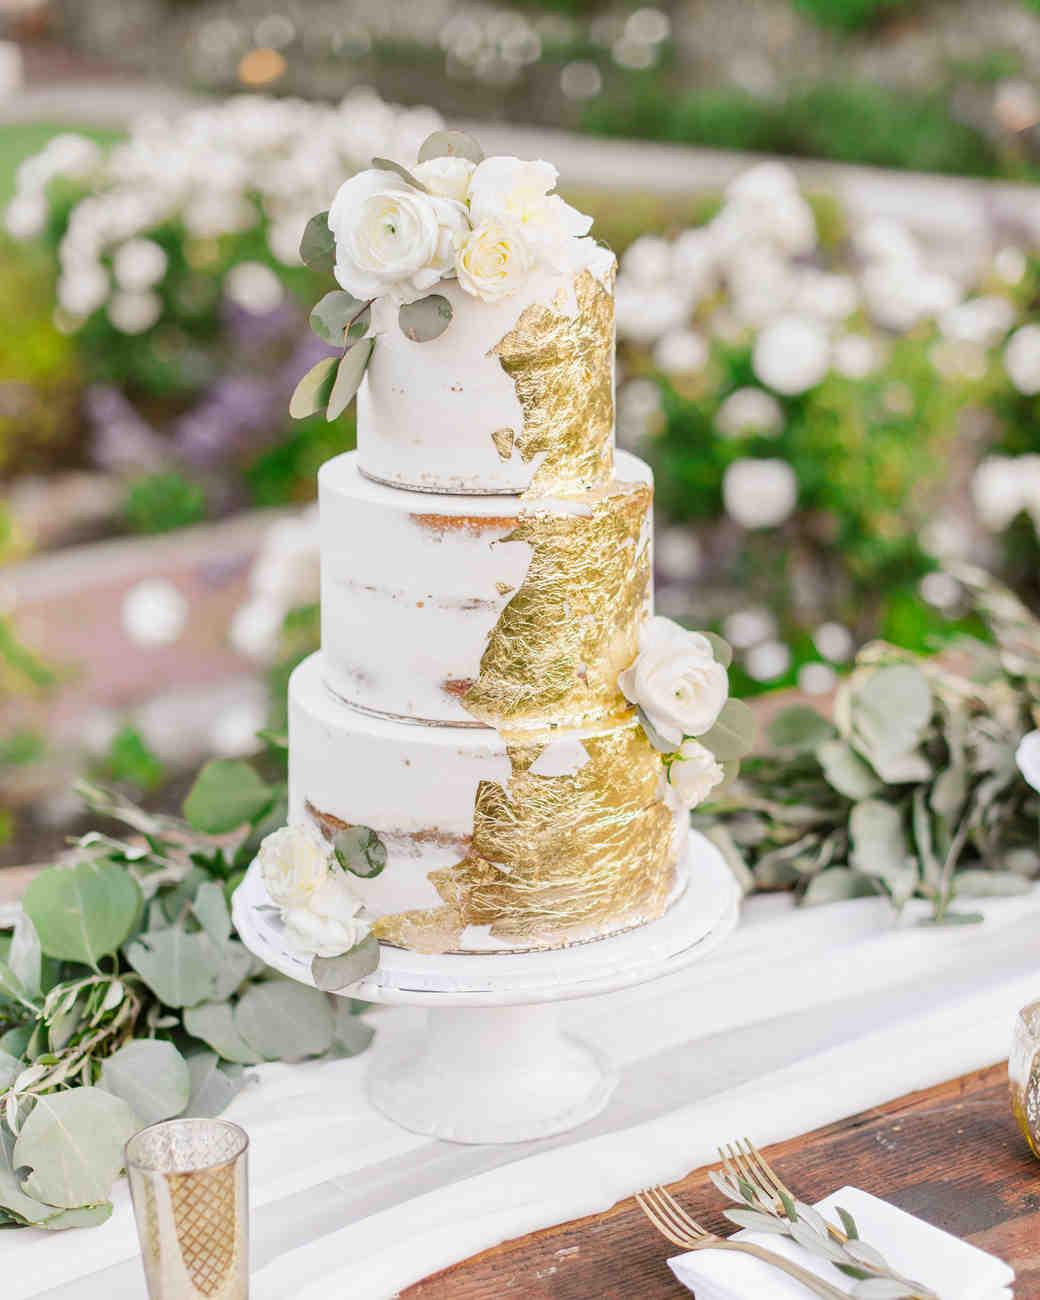 Eucalyptus wedding cake decor table centerpiece